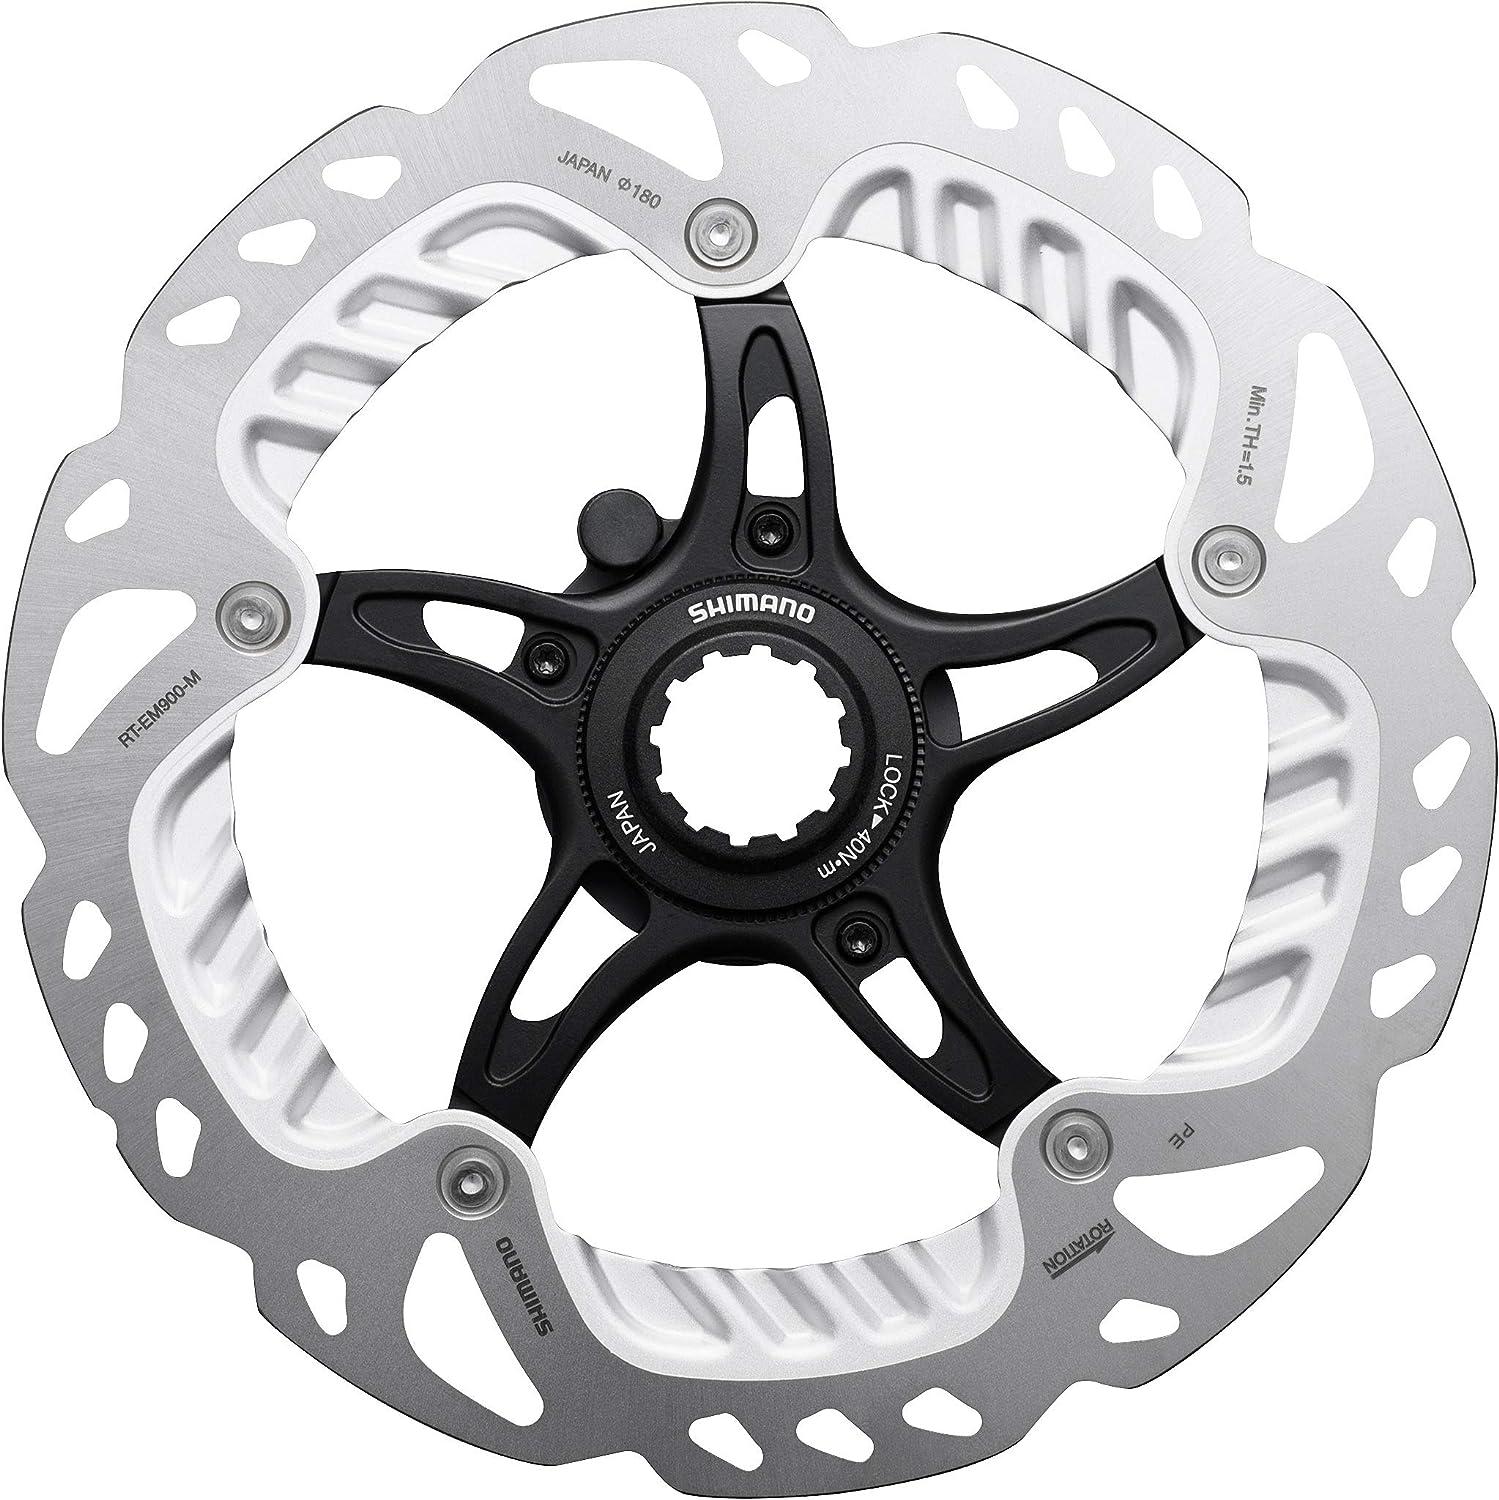 Shimano Unisexs RTEM900L Bike Parts Standard One